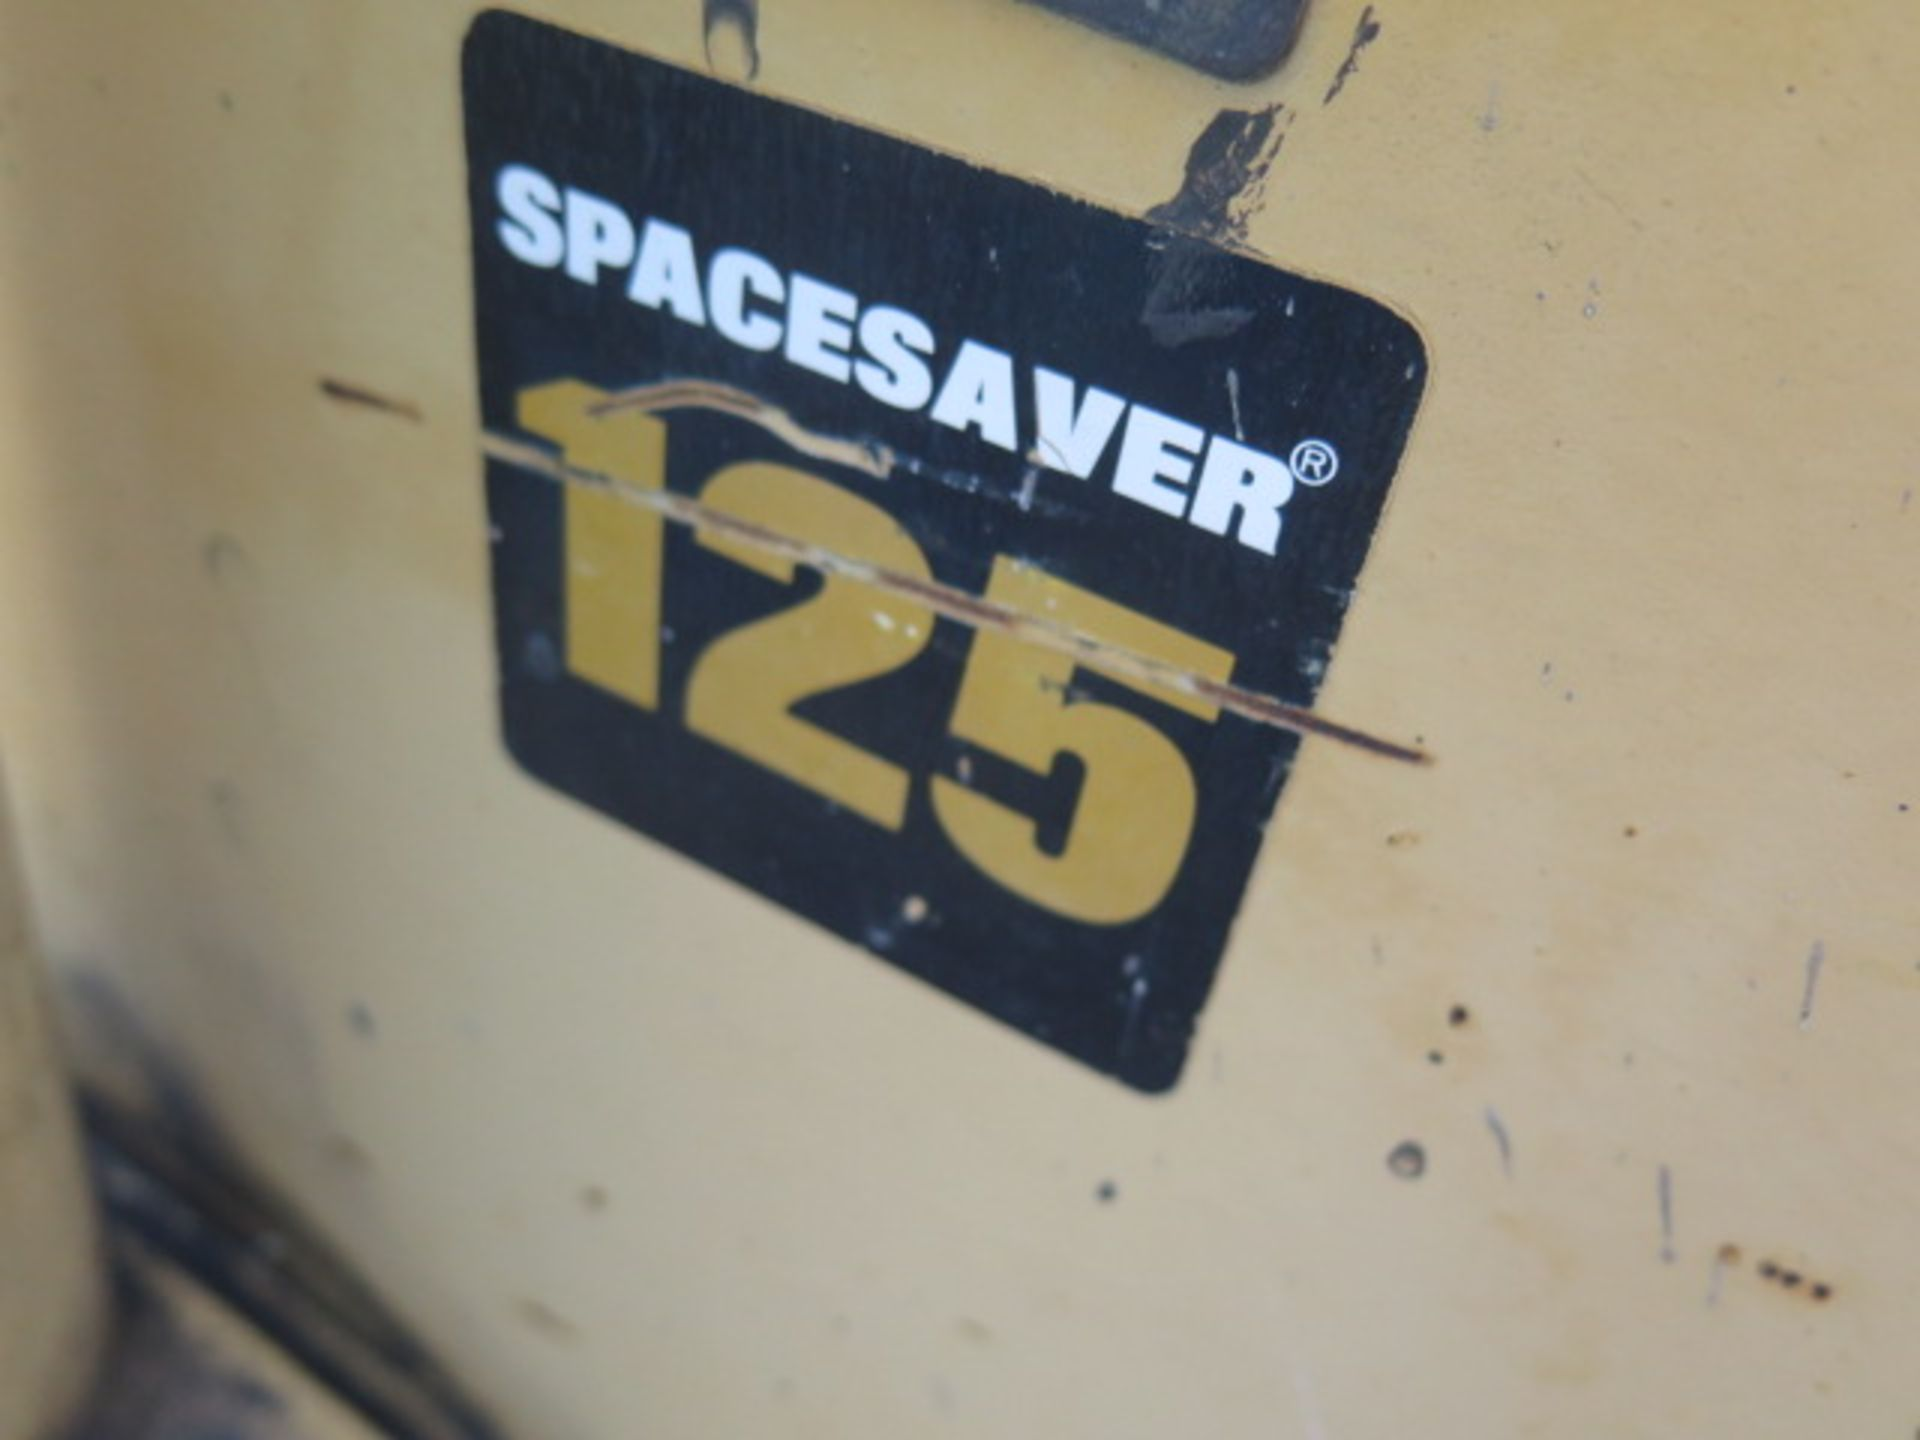 "Hyster S125A 12,500 Lb Cap LPG Forklift s/n A024DC4389A w/ 2-Stage Mast, 129"" Lift Height, 2-Speed T - Image 7 of 14"